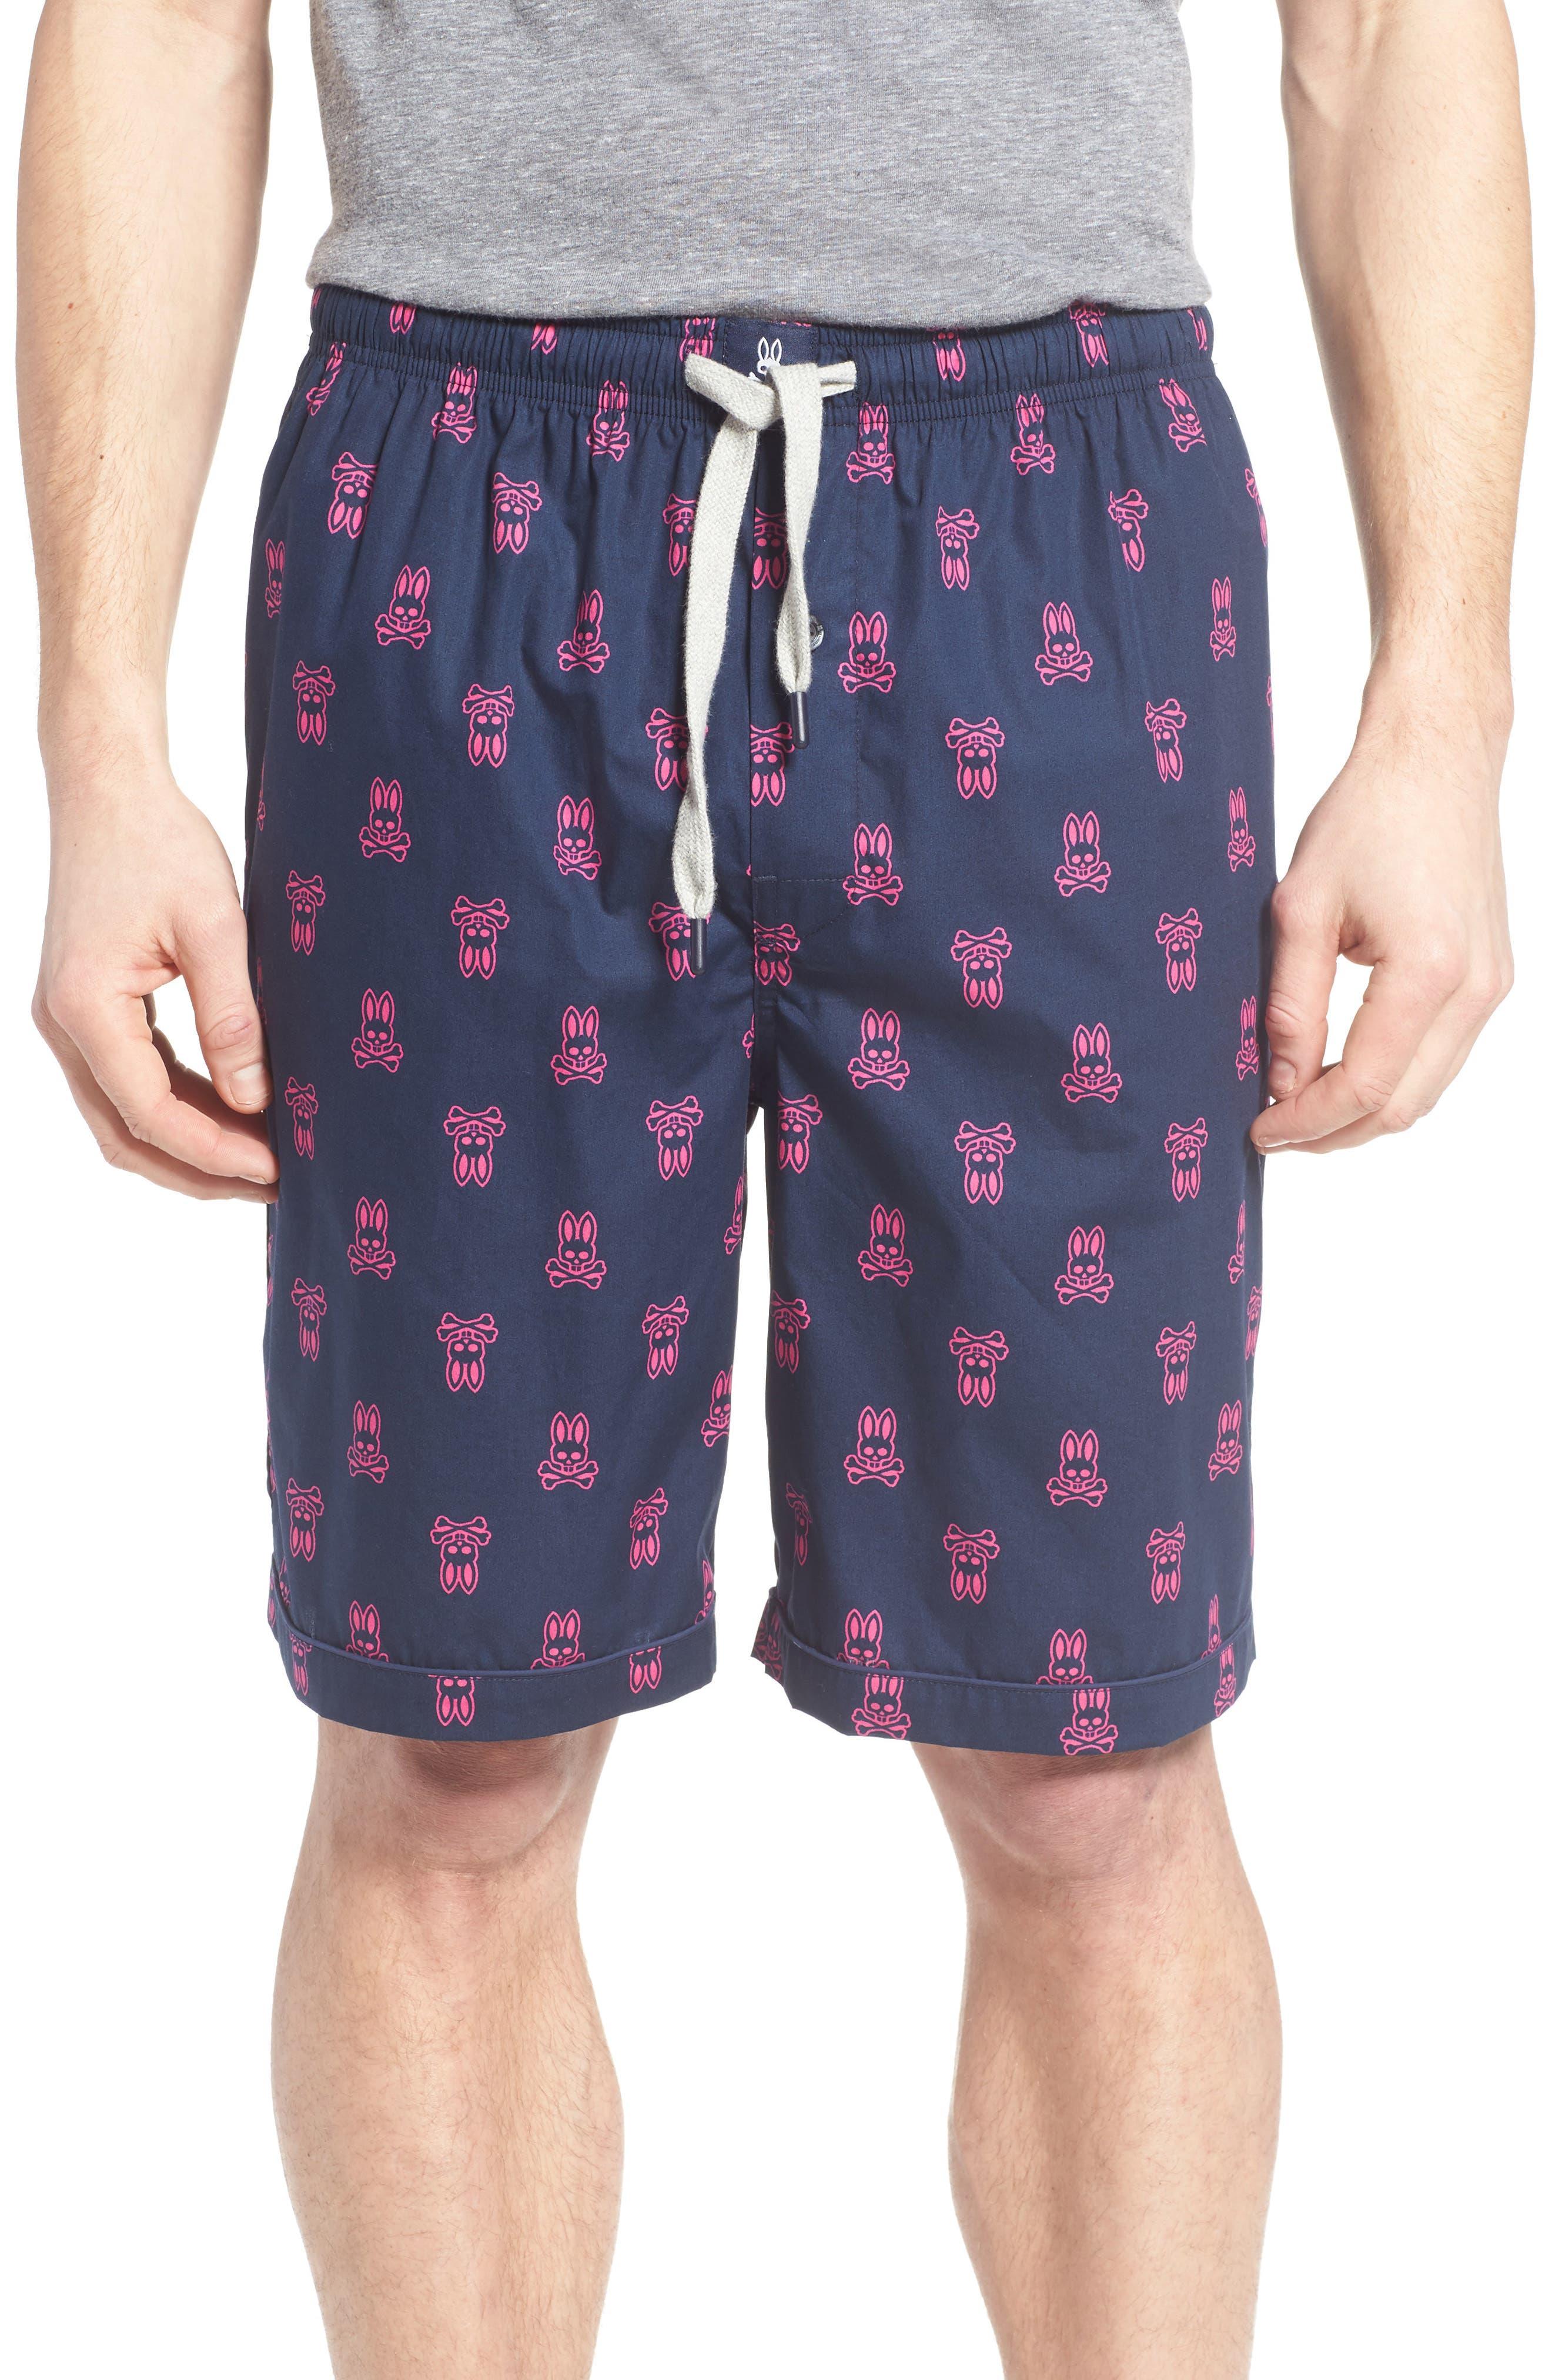 Cotton Lounge Shorts,                             Main thumbnail 1, color,                             Peacoat Bunny